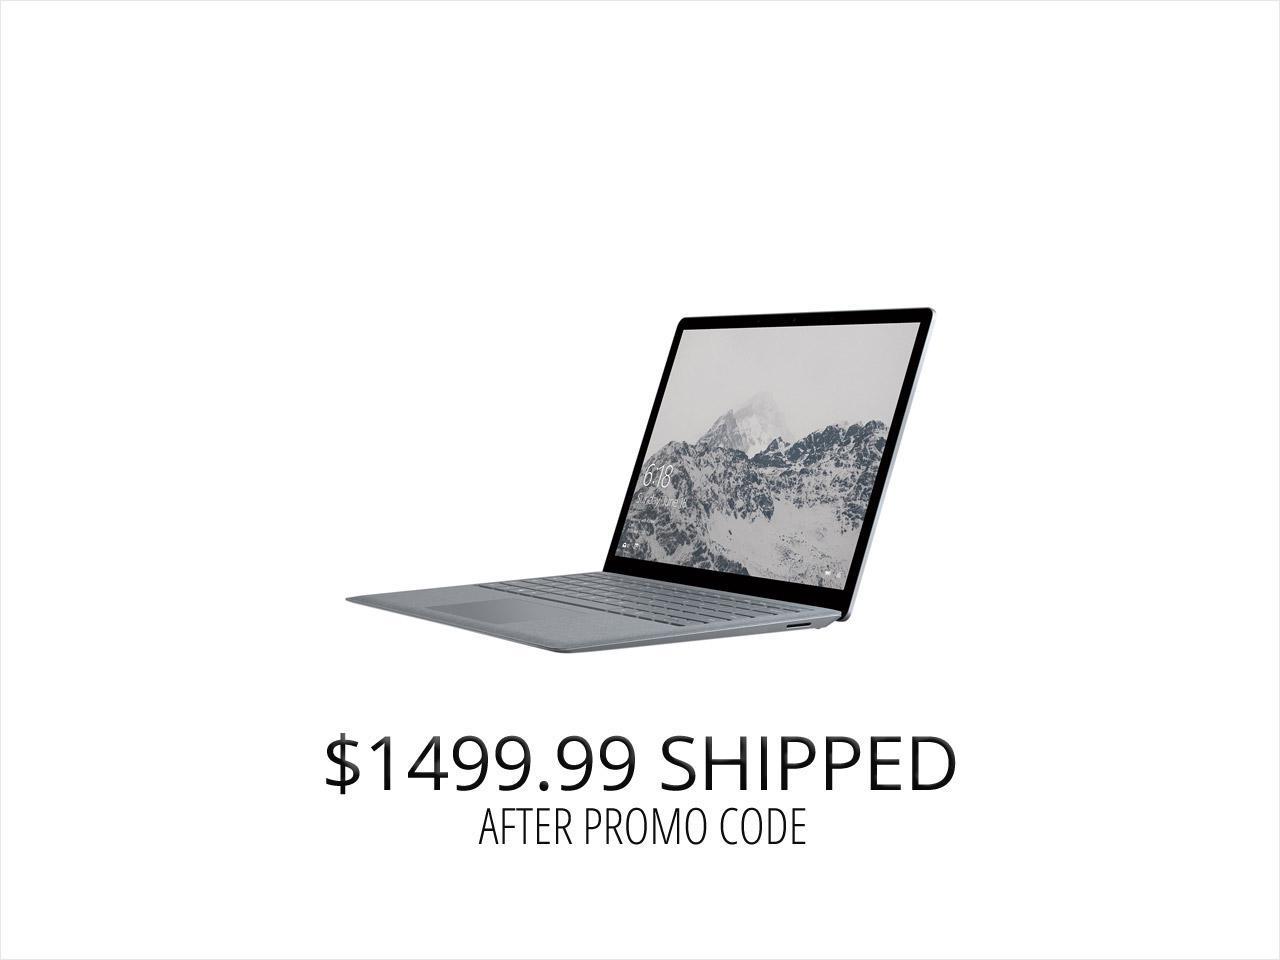 "Microsoft Surface 13.5"" Laptop DAJ-00001 Intel Core i7 7th Gen 7660U (2.50 GHz) 8 GB Memory 256 GB SSD Intel Iris Plus Graphics 640 Touchscreen Windows 10 S - Platinum"